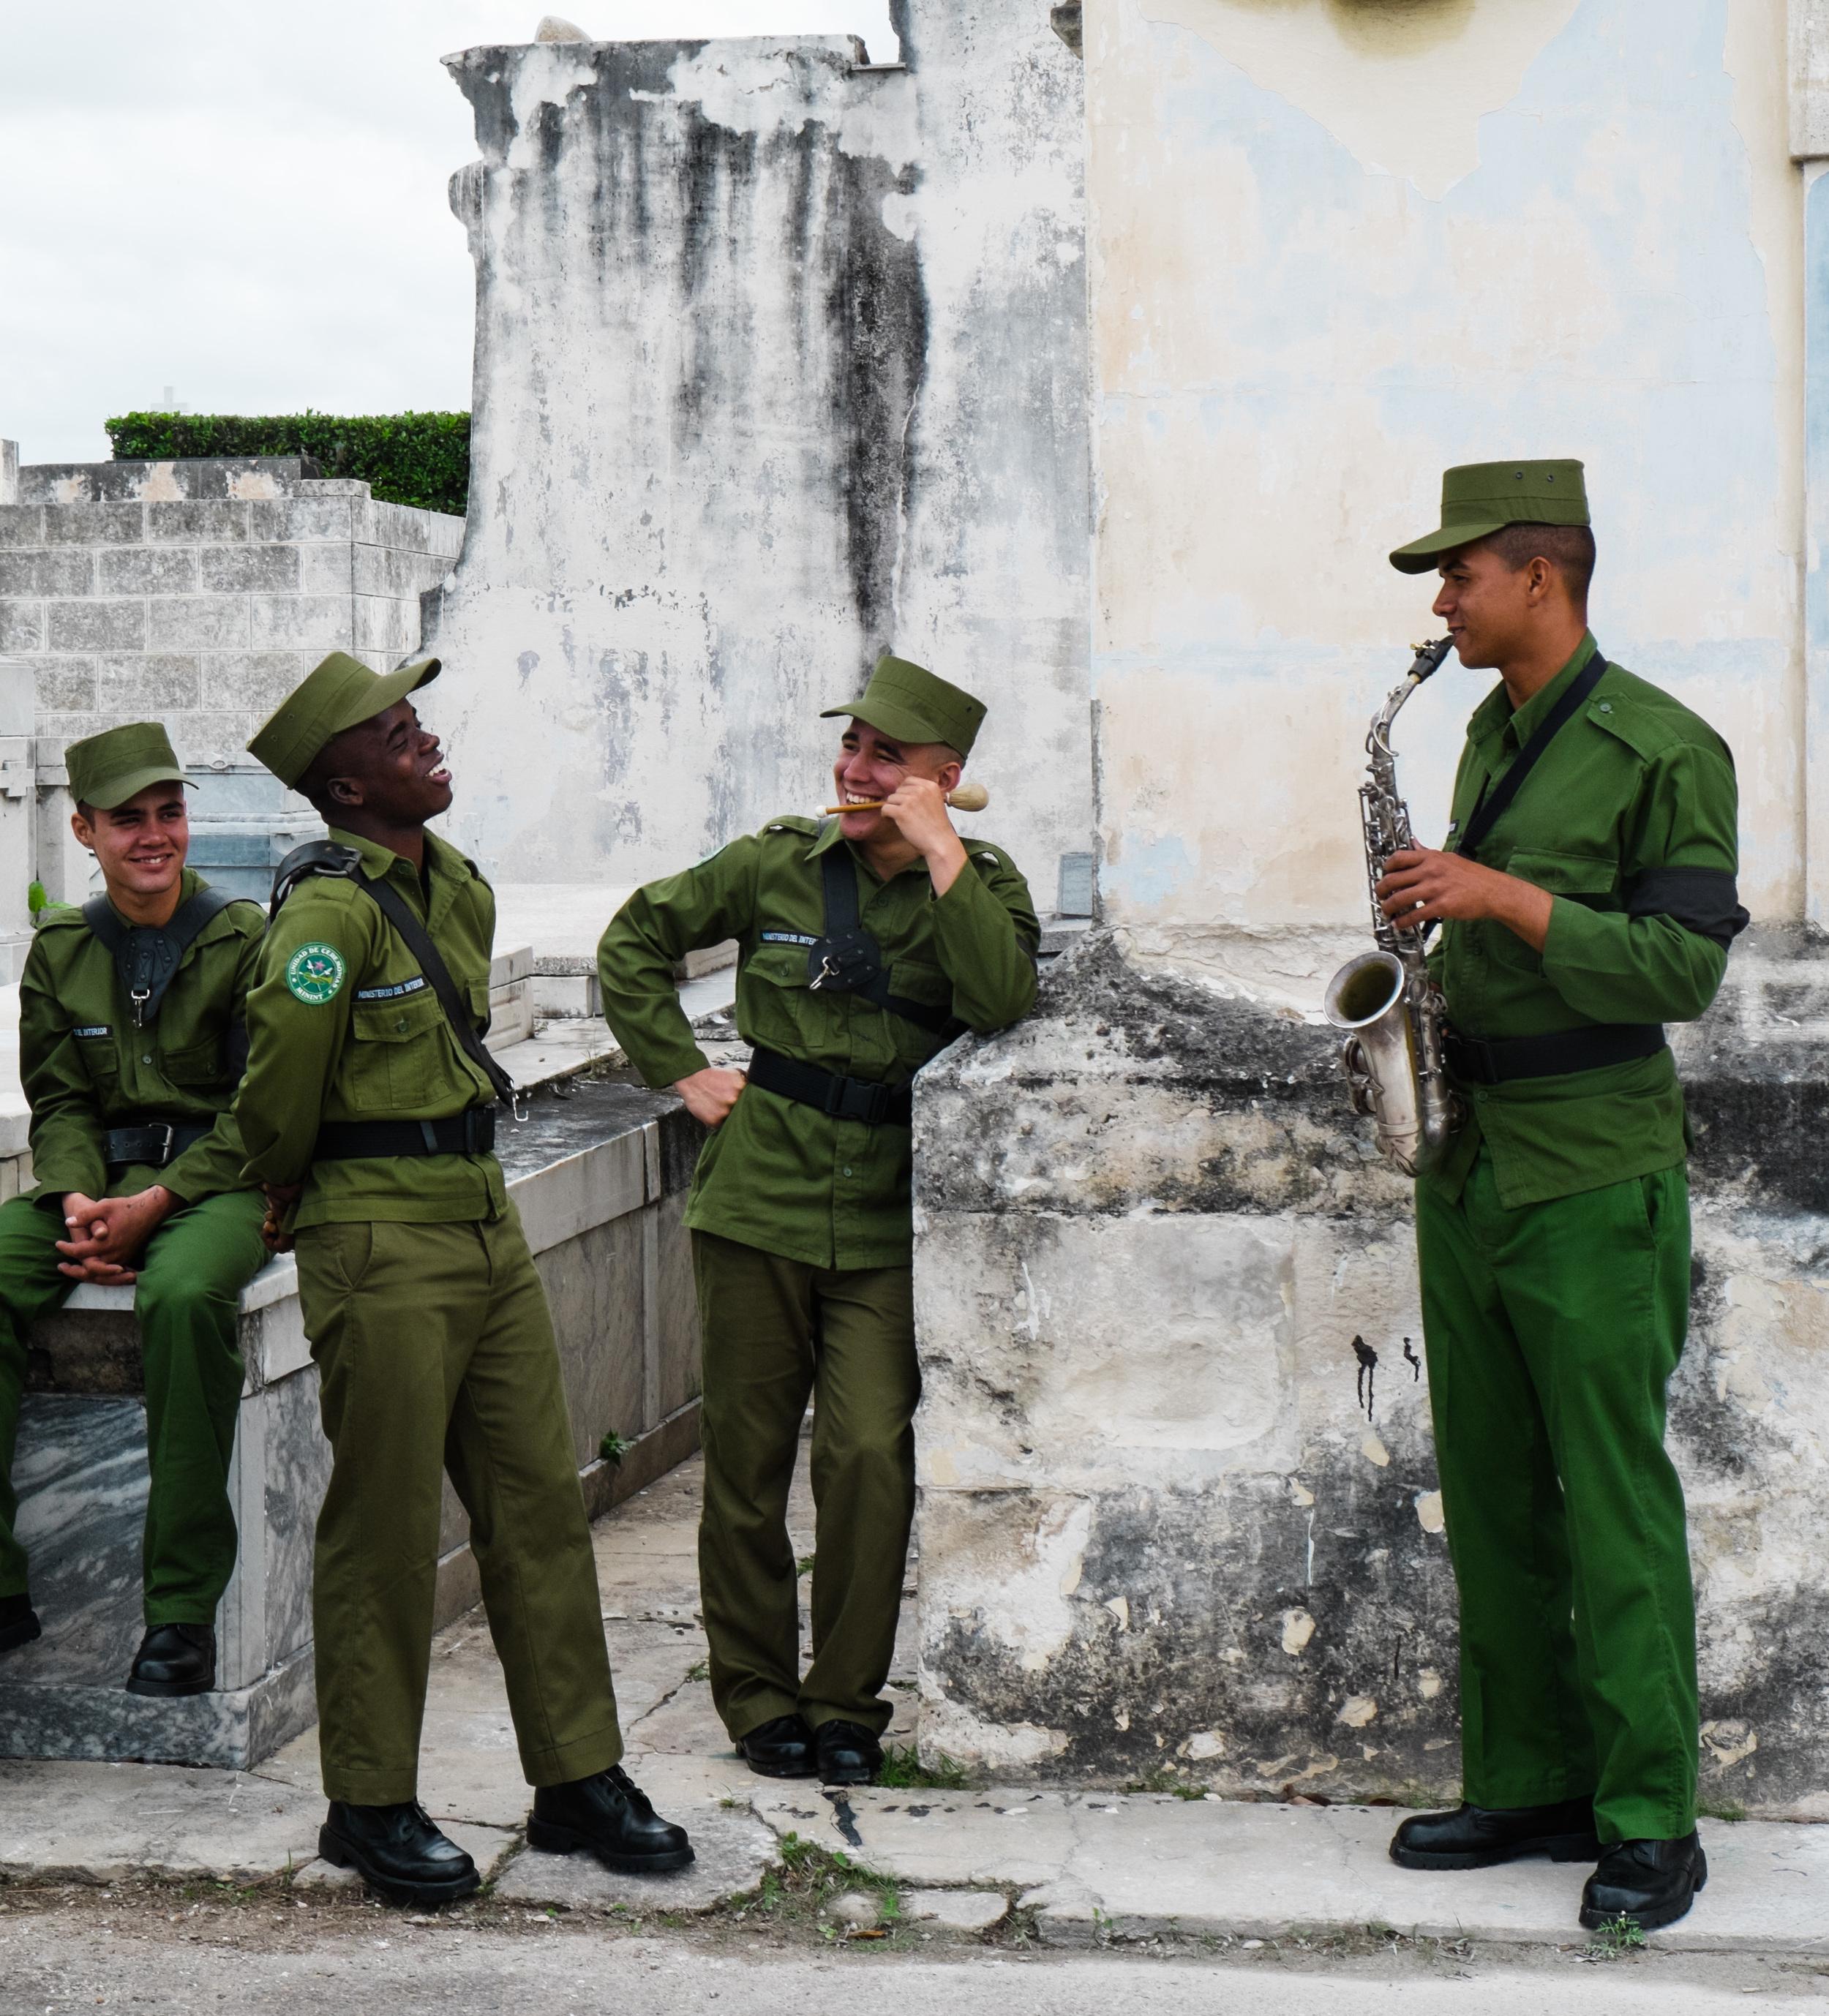 militaryband.jpg